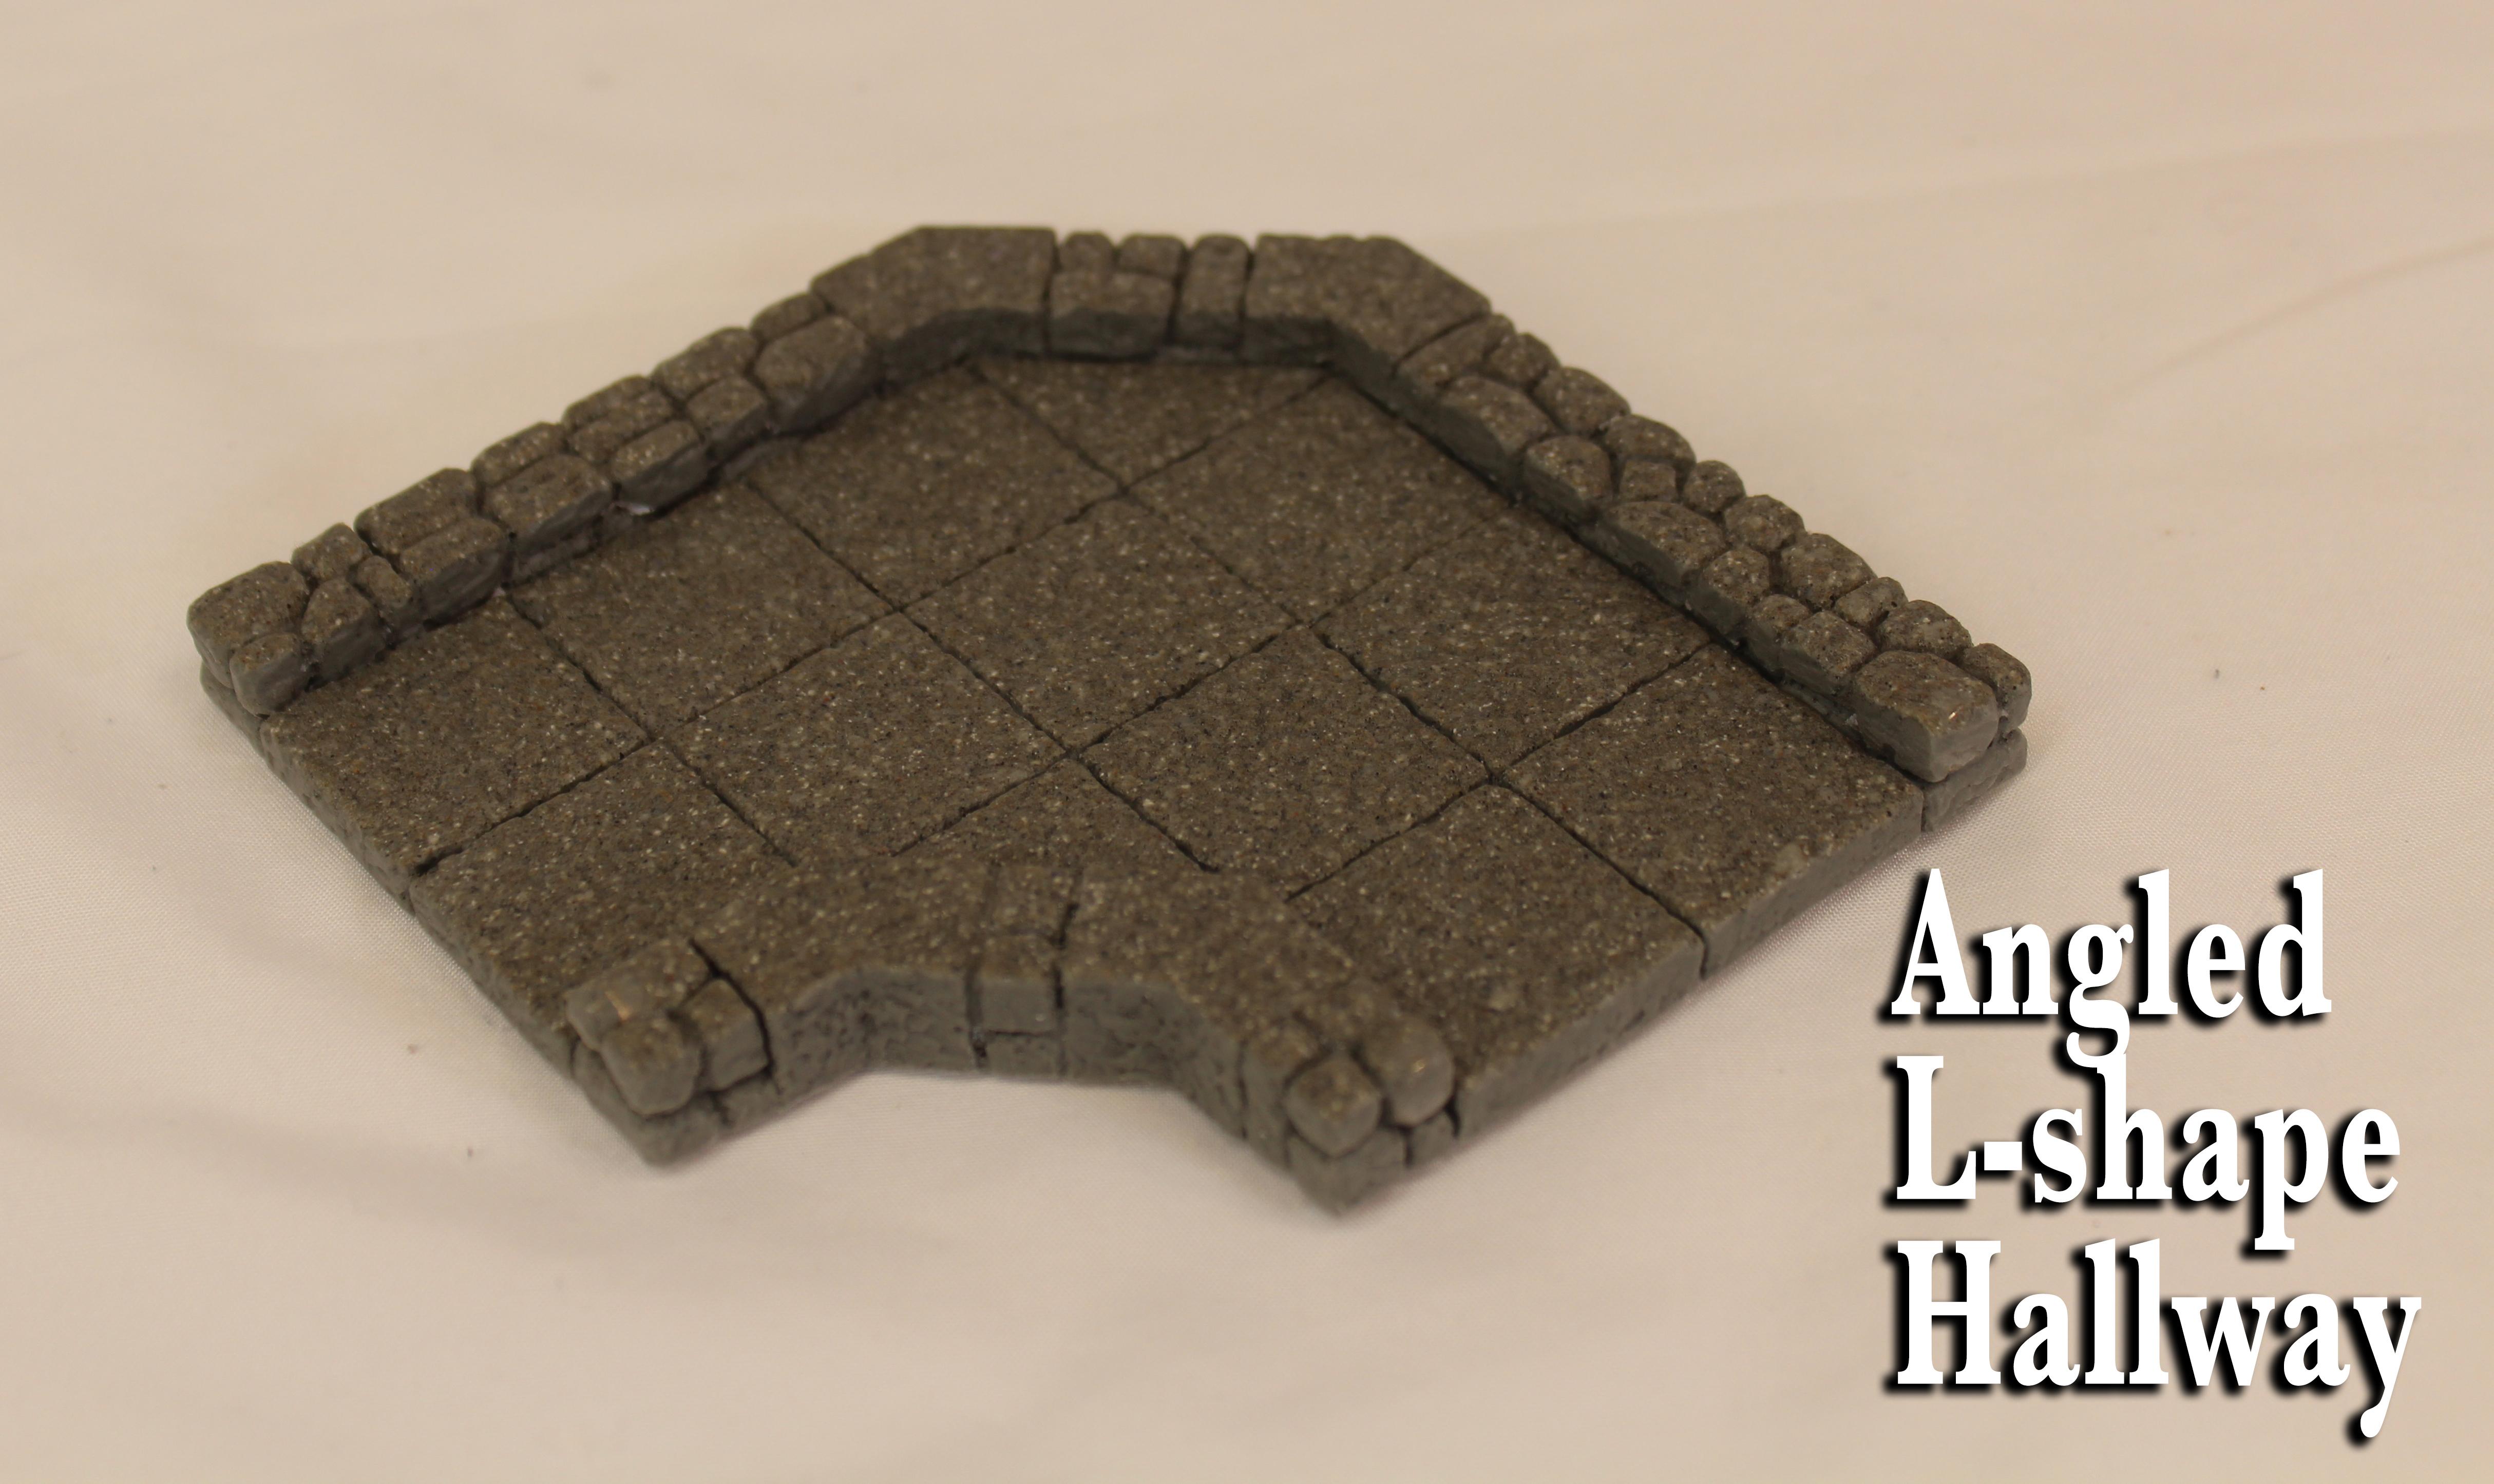 Angled L-shape Hallway 00013